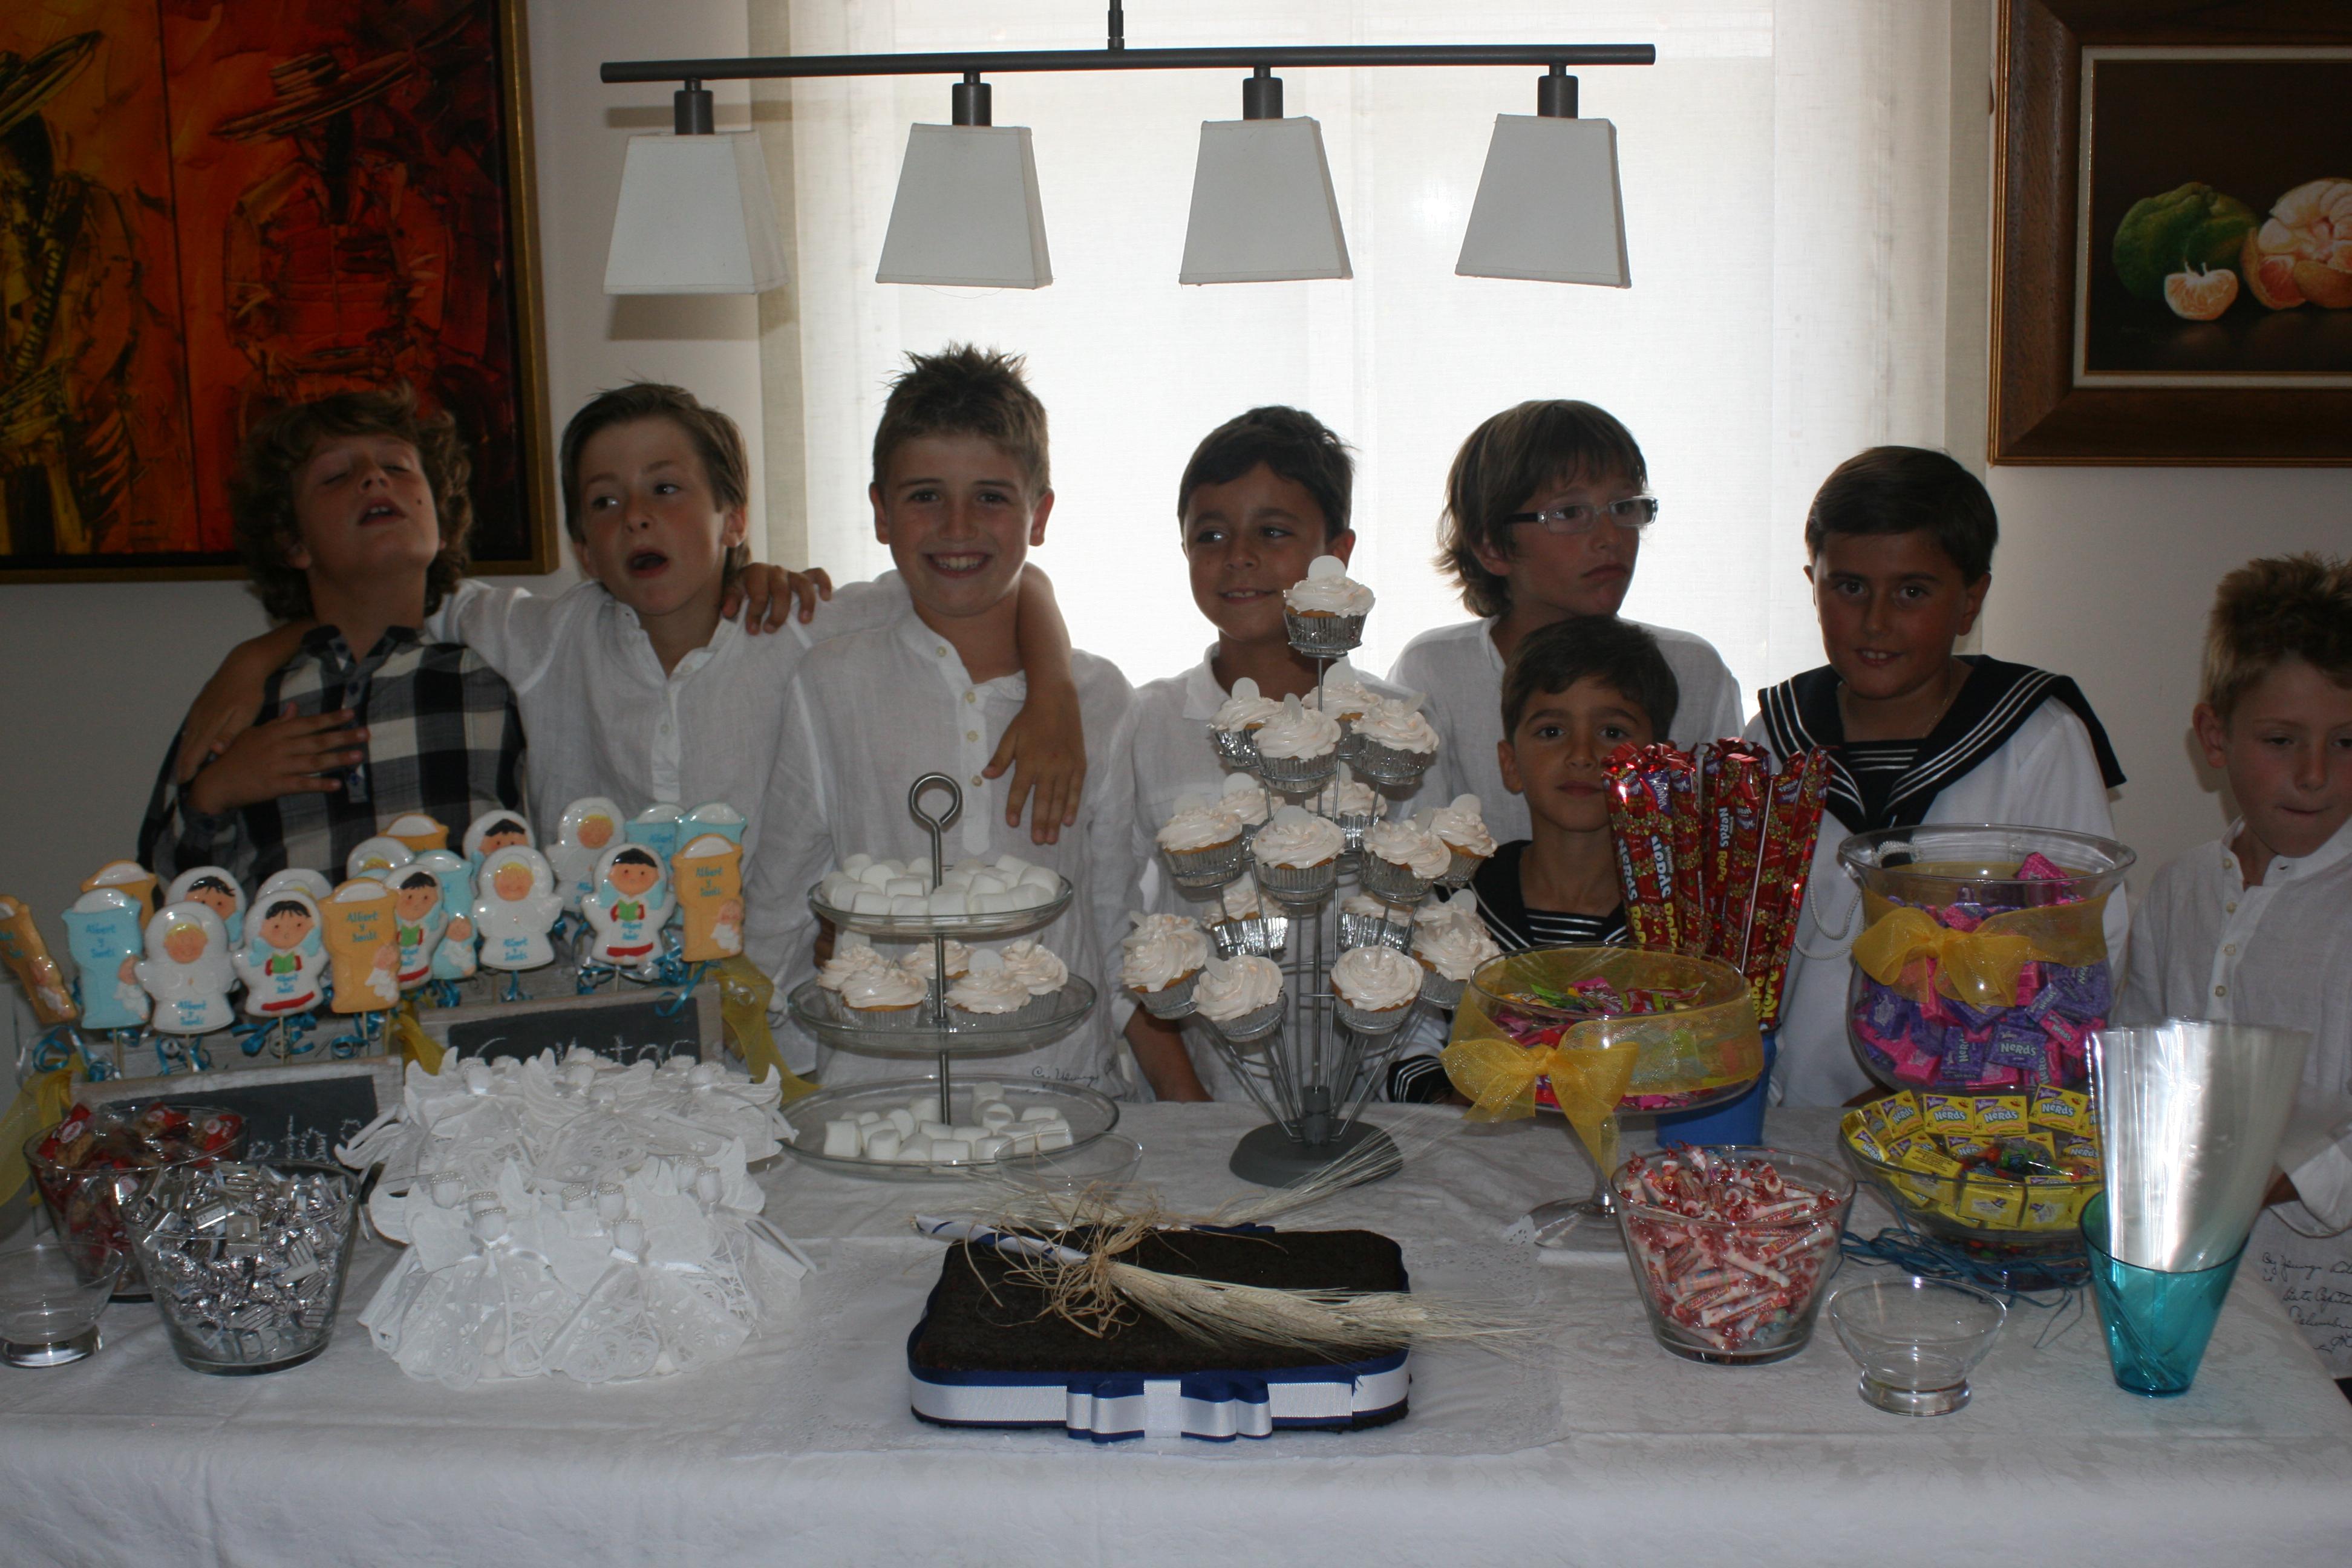 Primera comuni n bubblykido for Mesas dulces para comunion